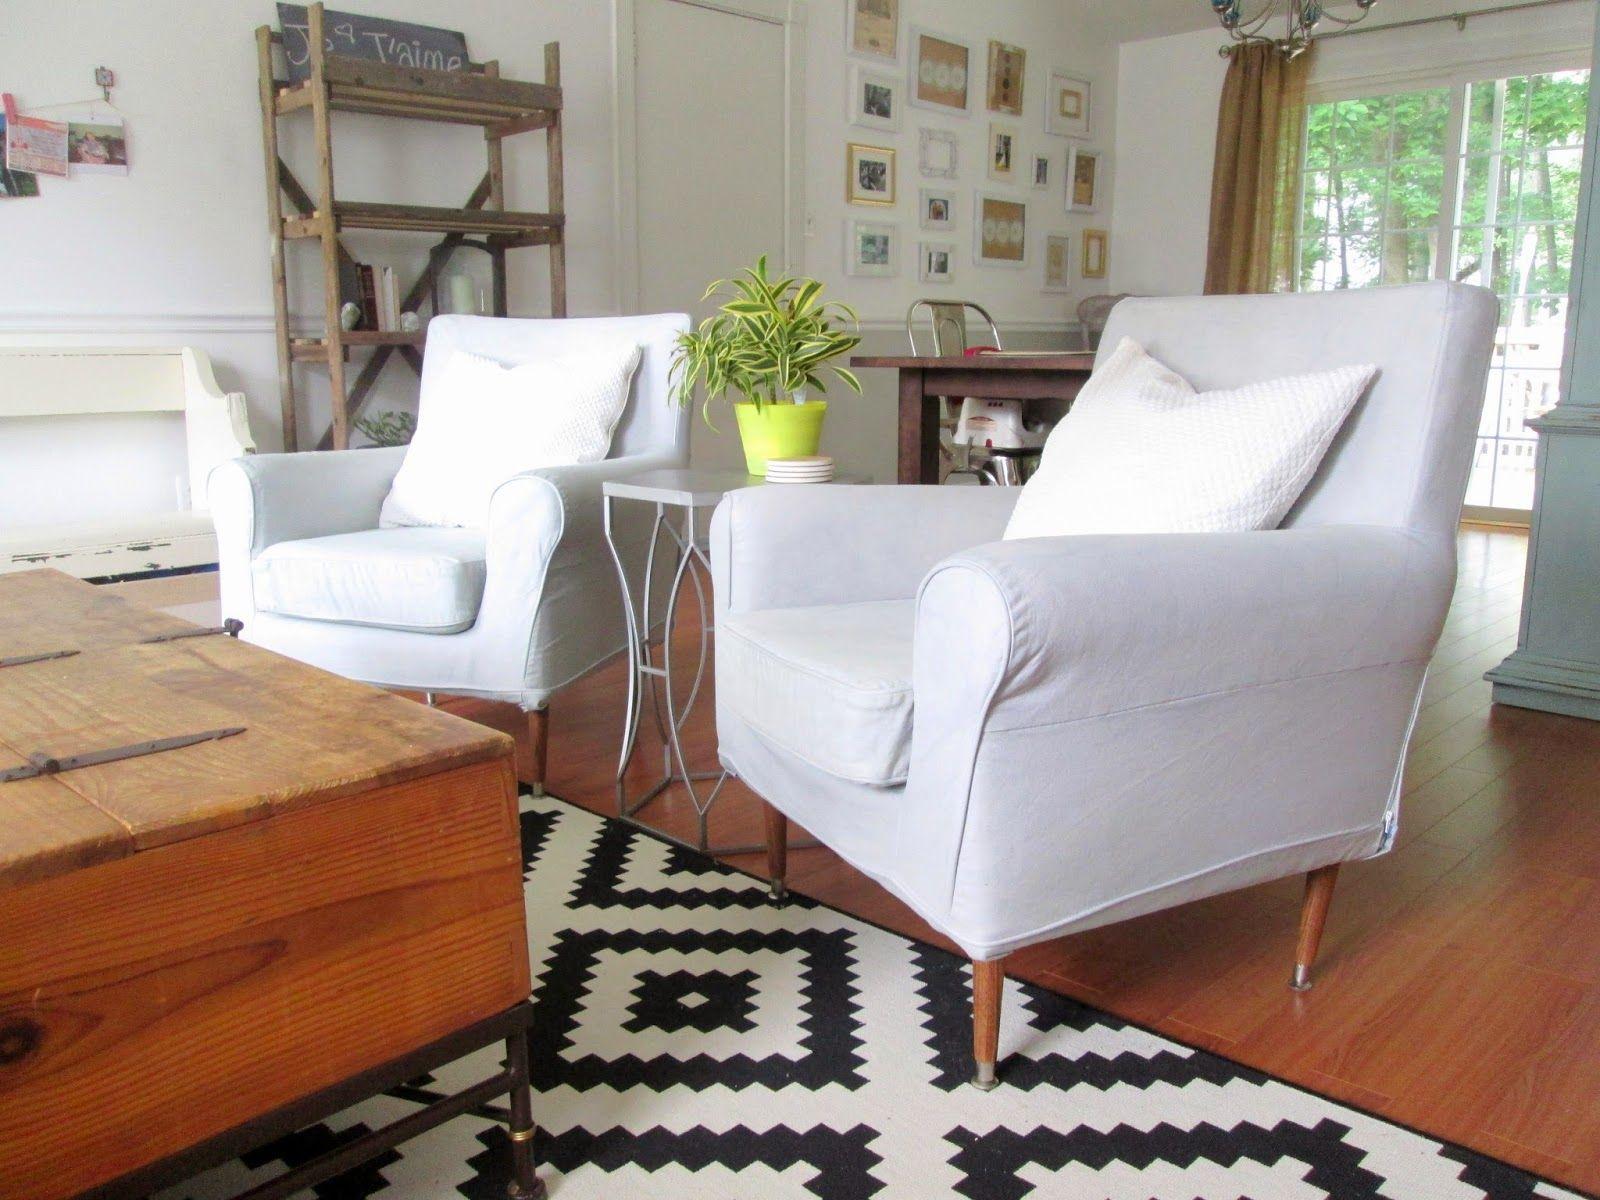 Room Chelseau0027s Garage DIY Mid century modern chairs